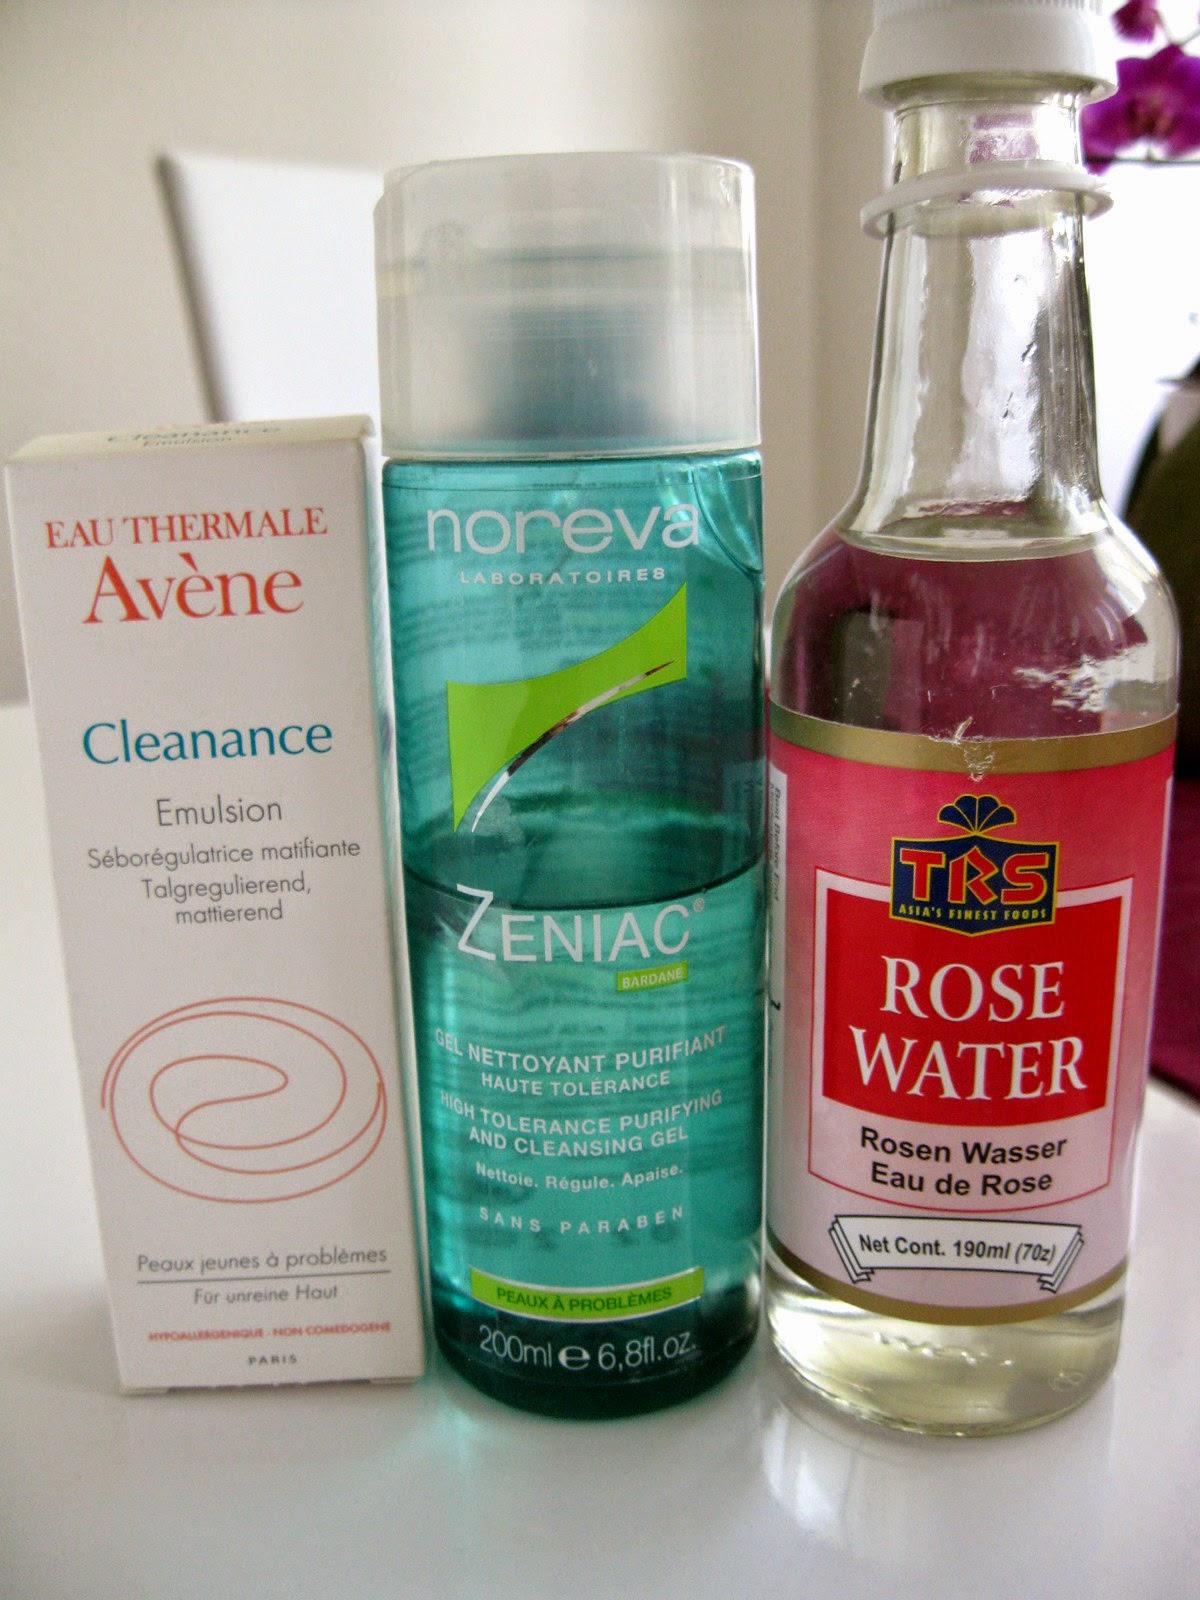 Noreva Zeniac, Avene Cleanance gegen Pickel